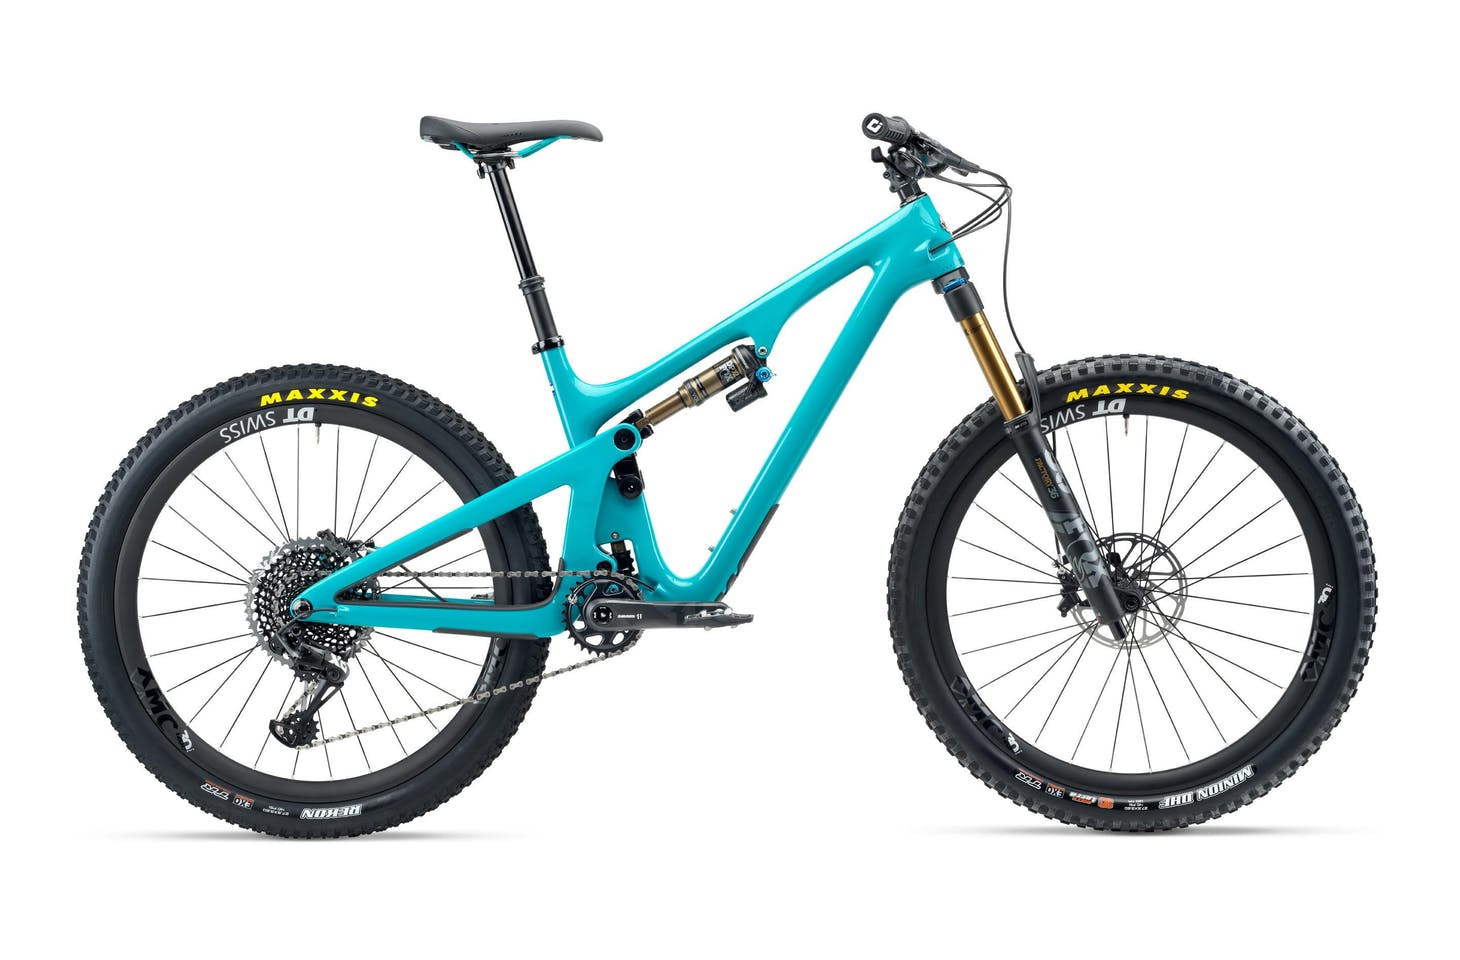 Yeti bike model SB140